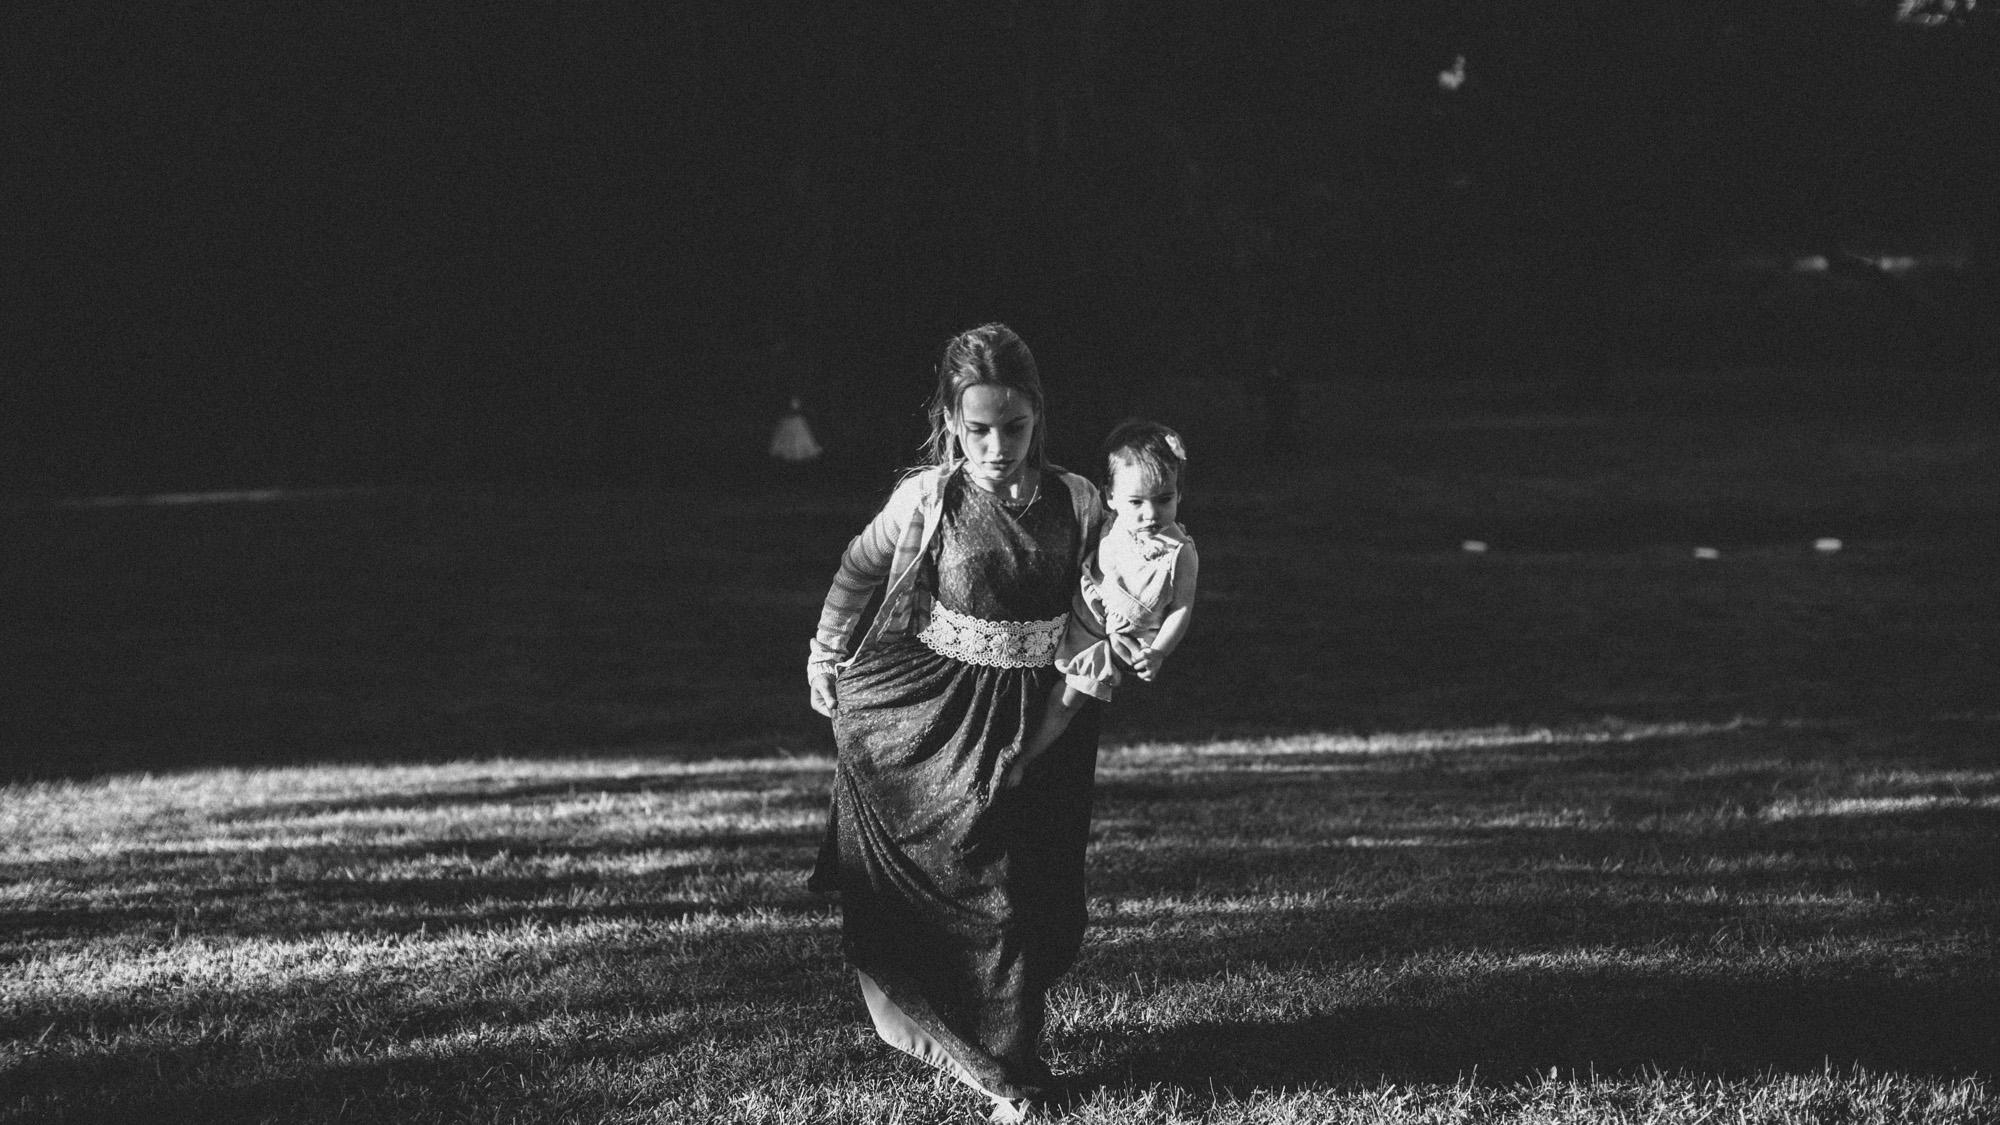 alec_vanderboom_springfield_missouri_wedding-0062.jpg